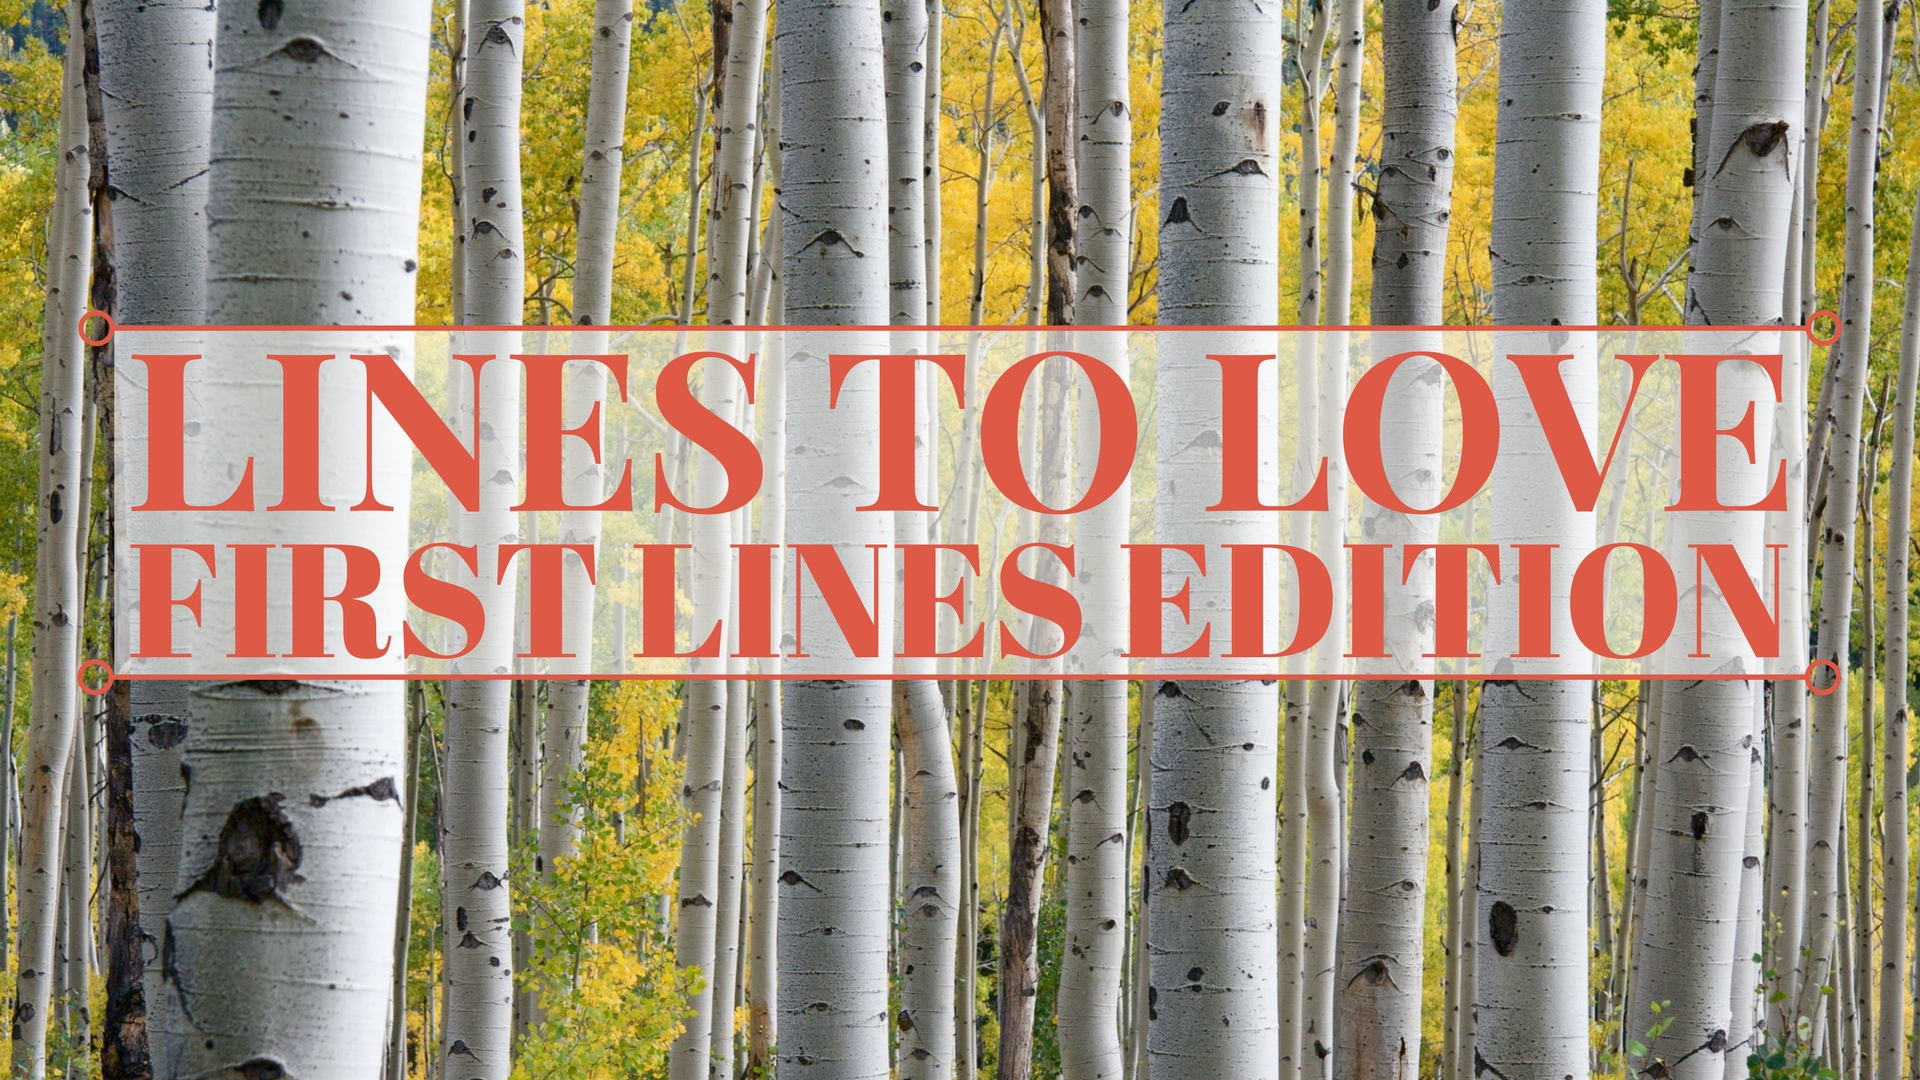 linestolove-firstlines.jpg